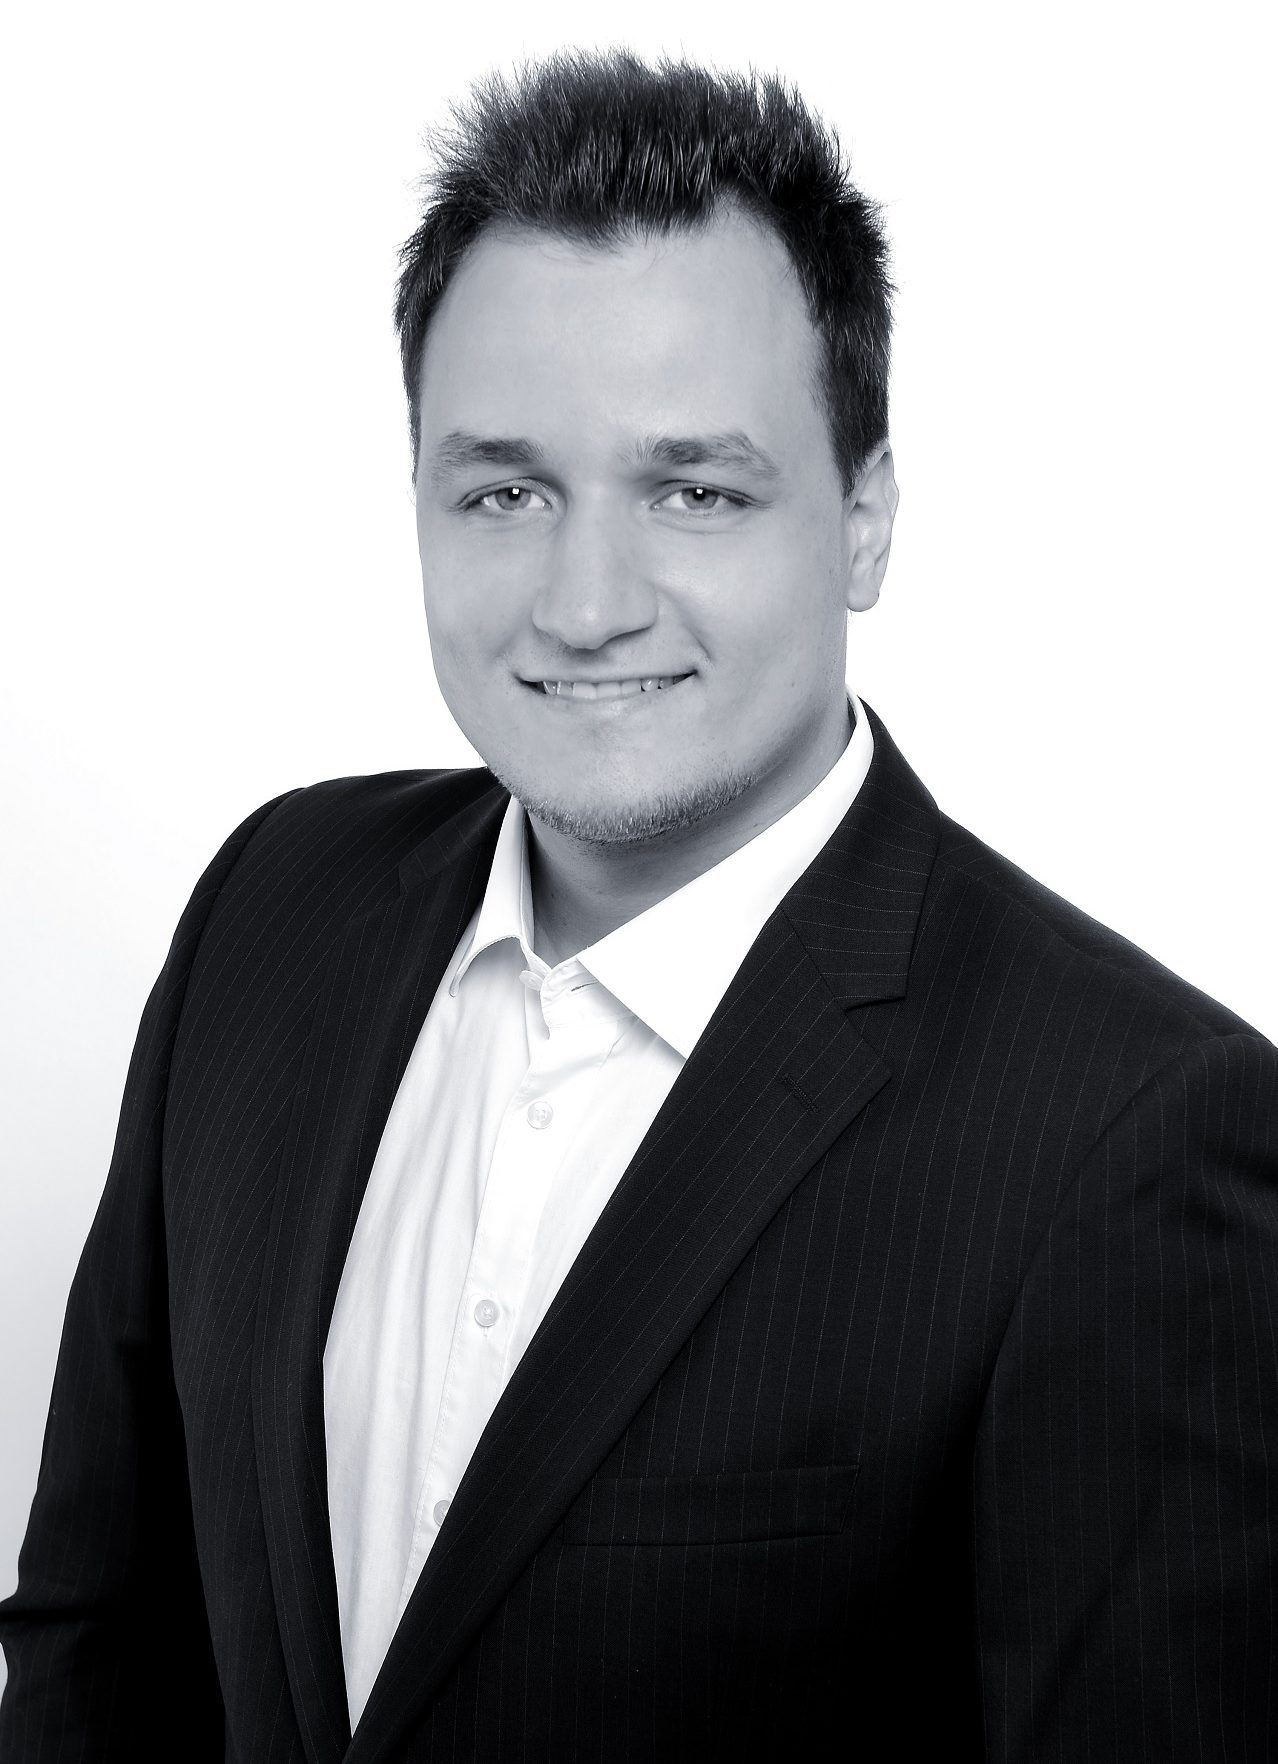 Michael Petrovic